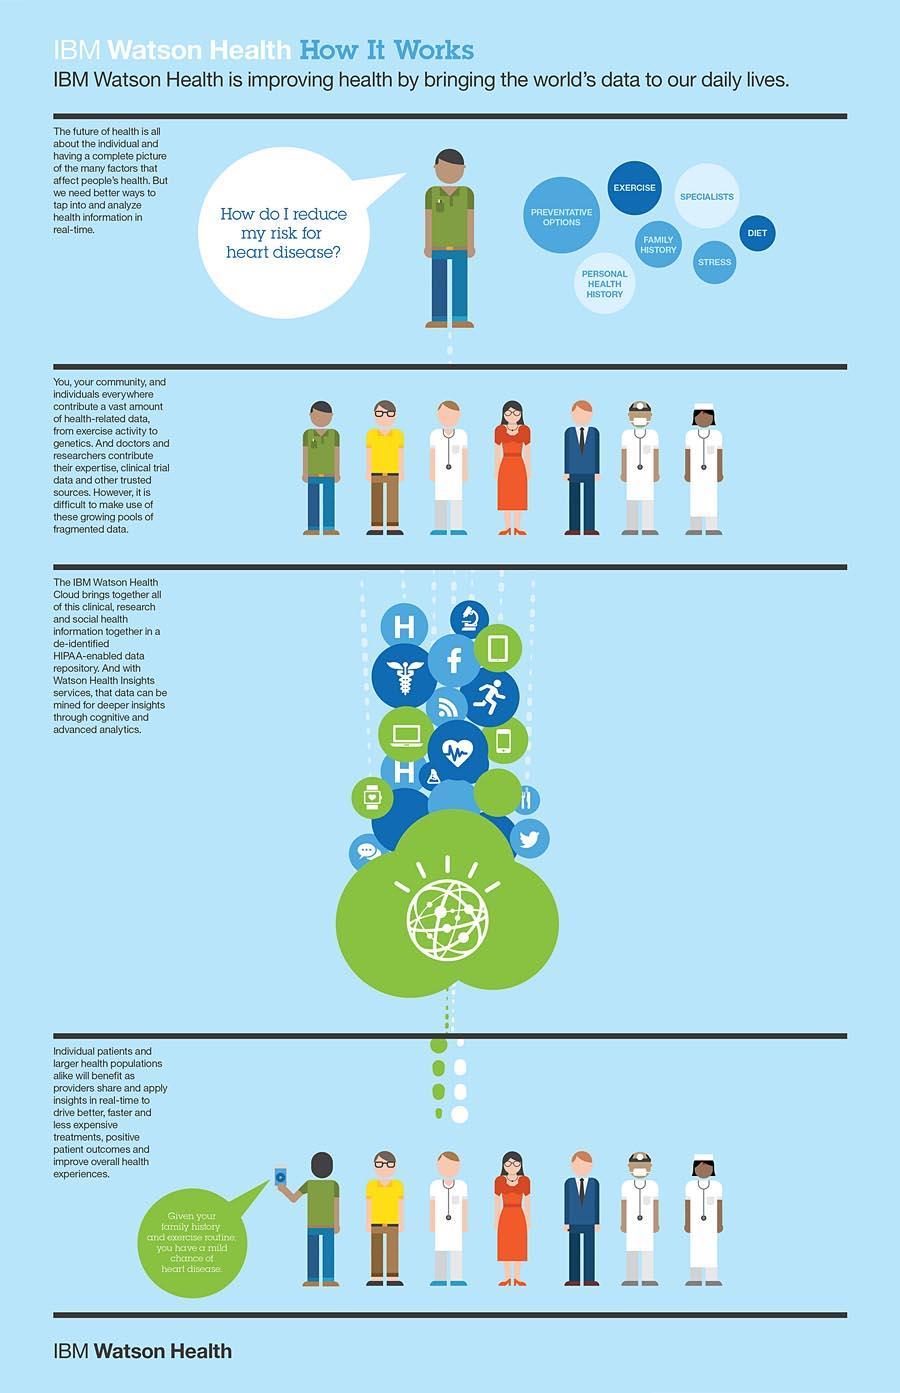 5999_IBM Watson Health 6